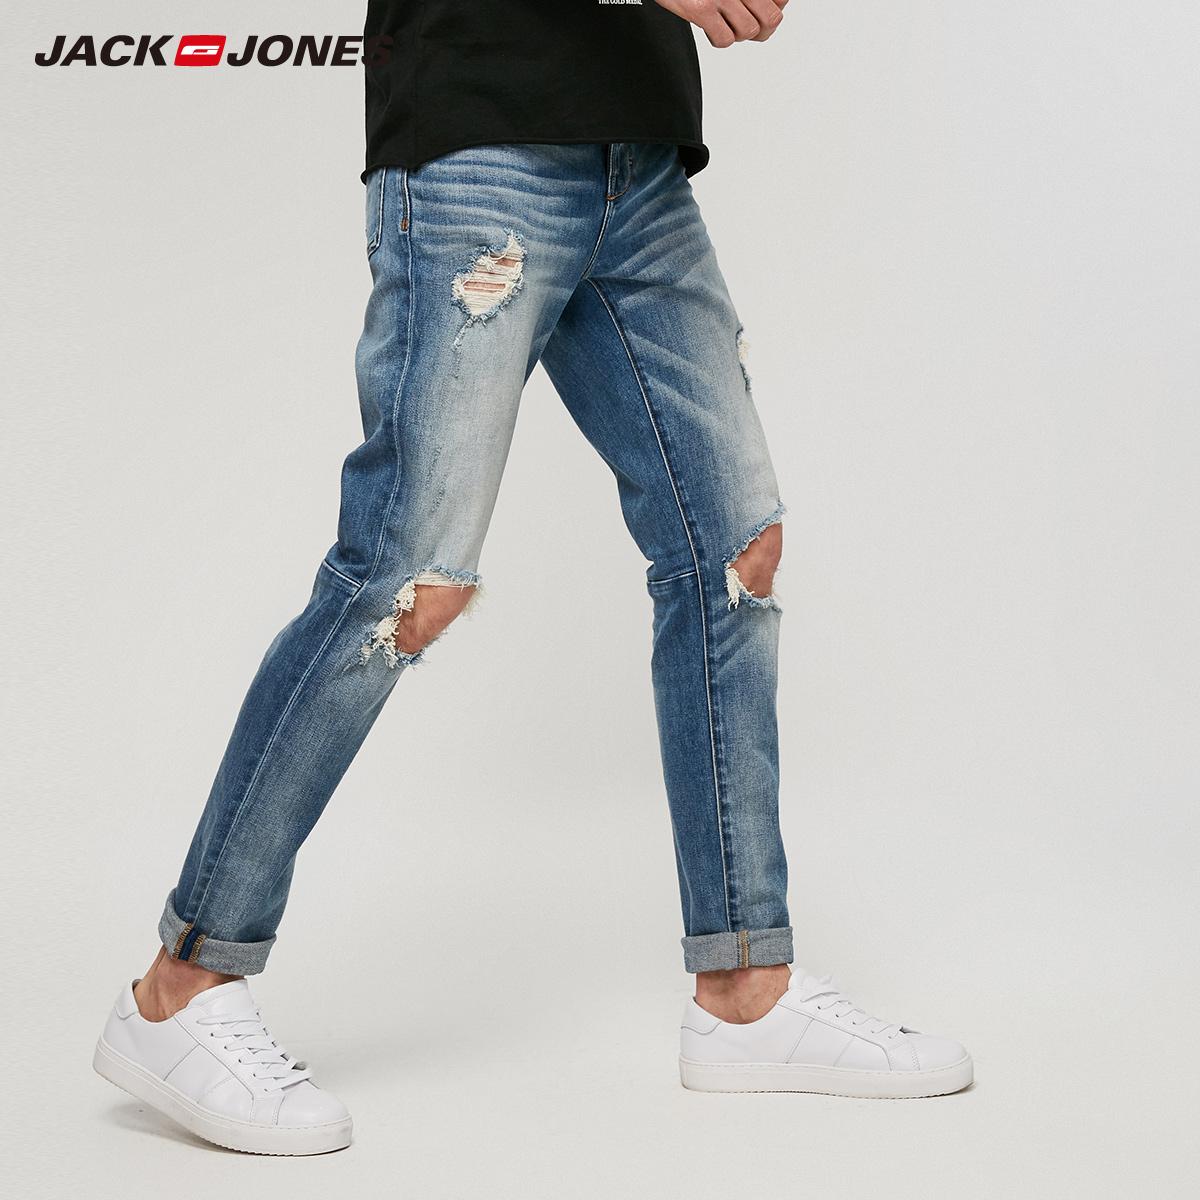 JackJones 杰克琼斯 男士破洞修身牛仔裤